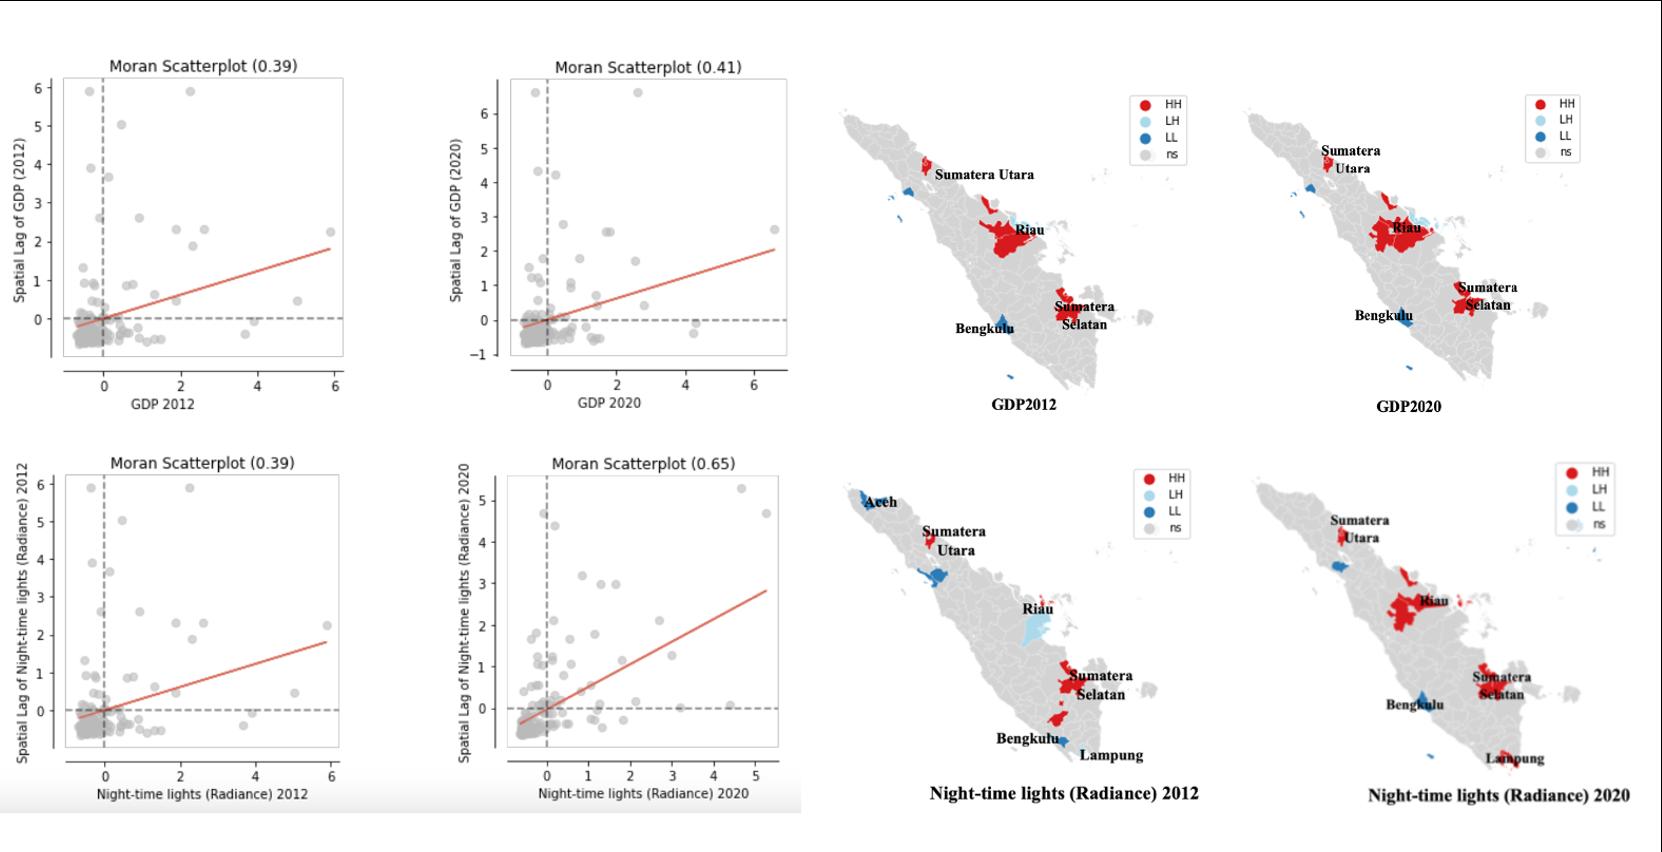 Regional Growth, Convergence, and Heterogeneity –image